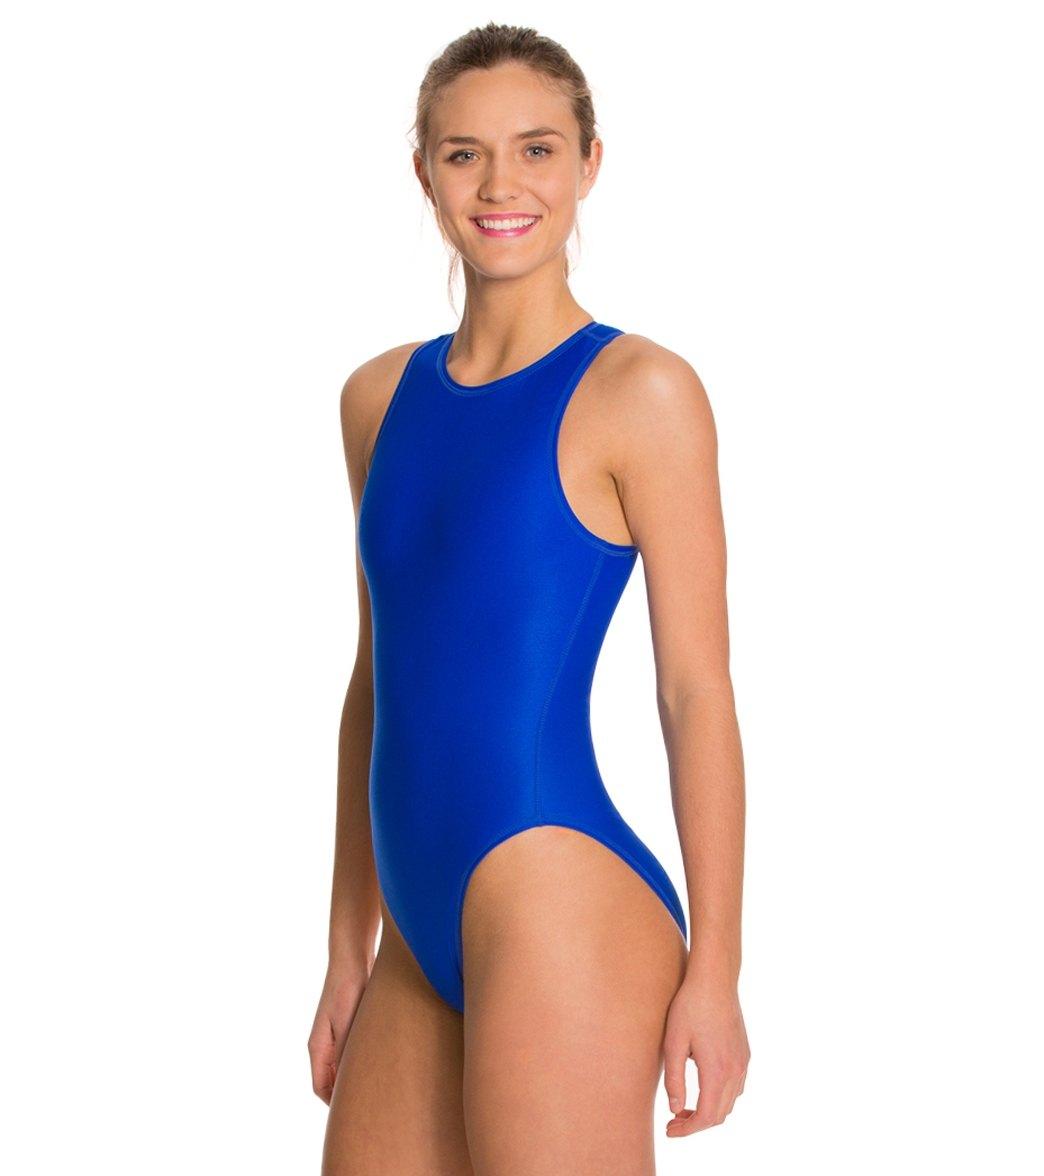 6527d00c2ba37 Waterpro Women s Water Polo One Piece Swimsuit at SwimOutlet.com